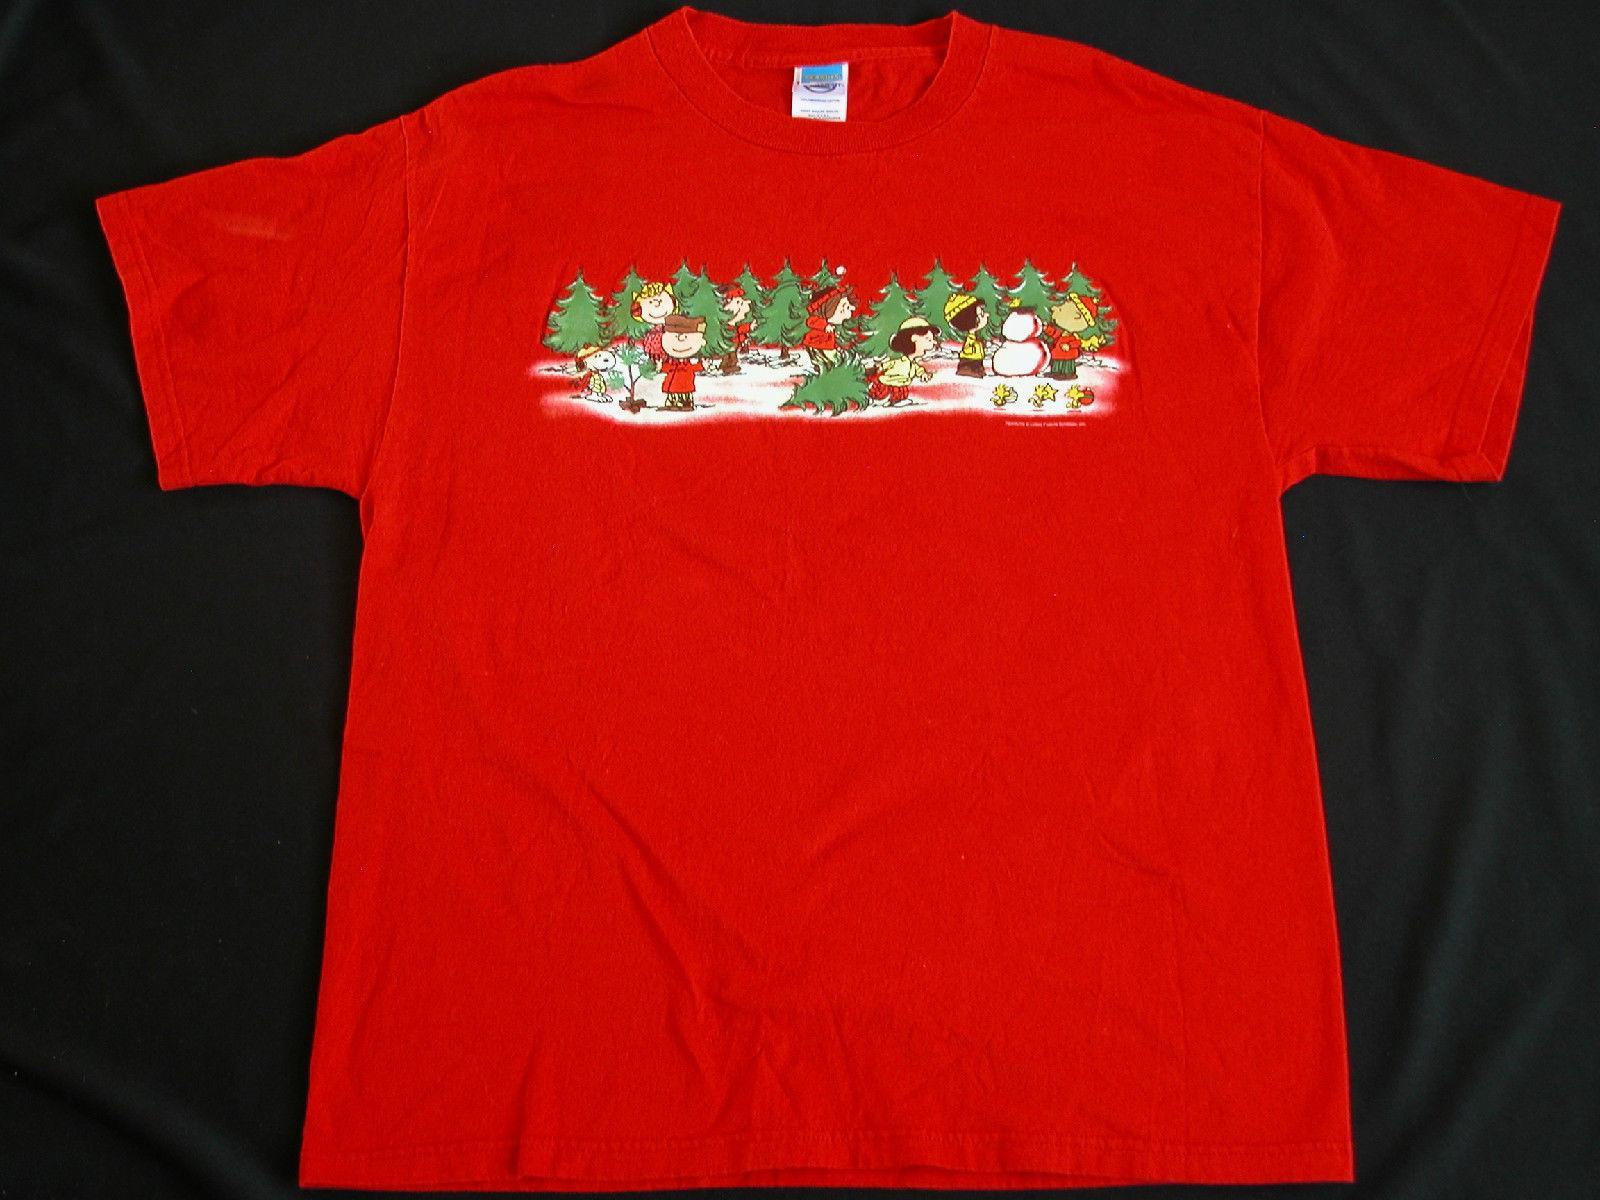 vtg 1990s charlie brown christmas t shirt peanuts schulz christmas tree shopping crazy tee shirts novelty t shirt from pitshop 1101 dhgatecom